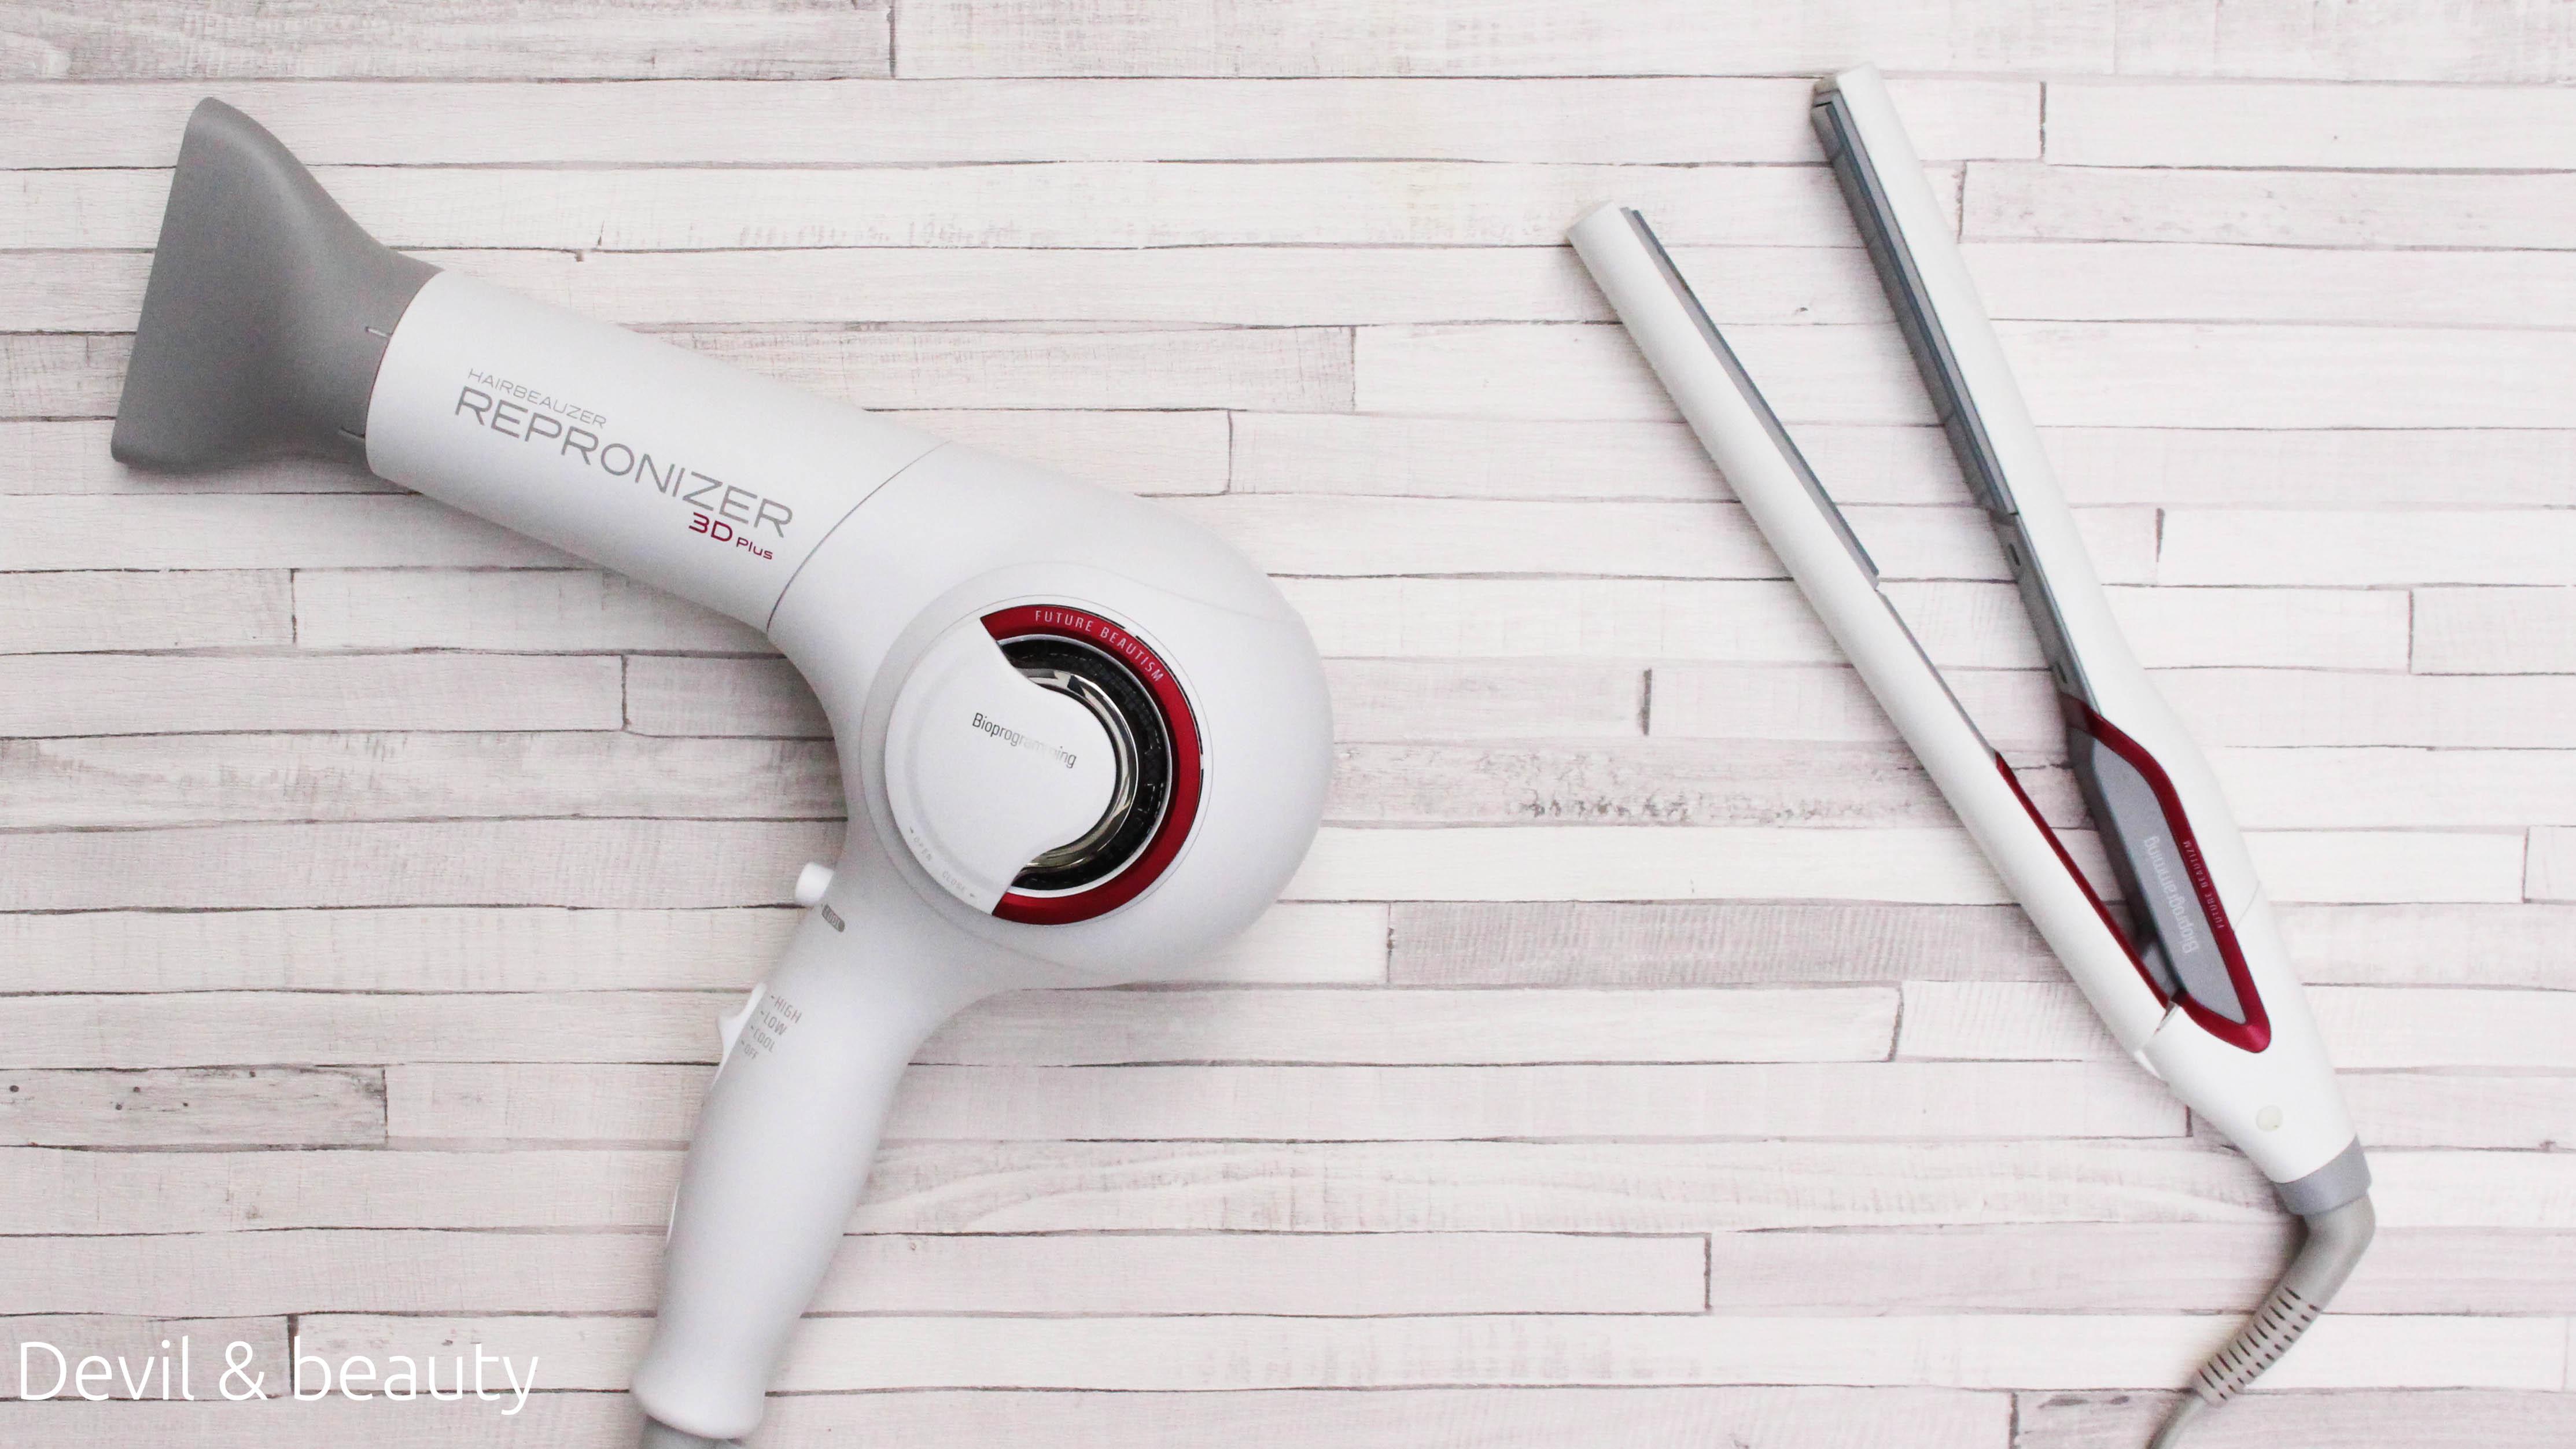 hairbeauron-repronizer - image